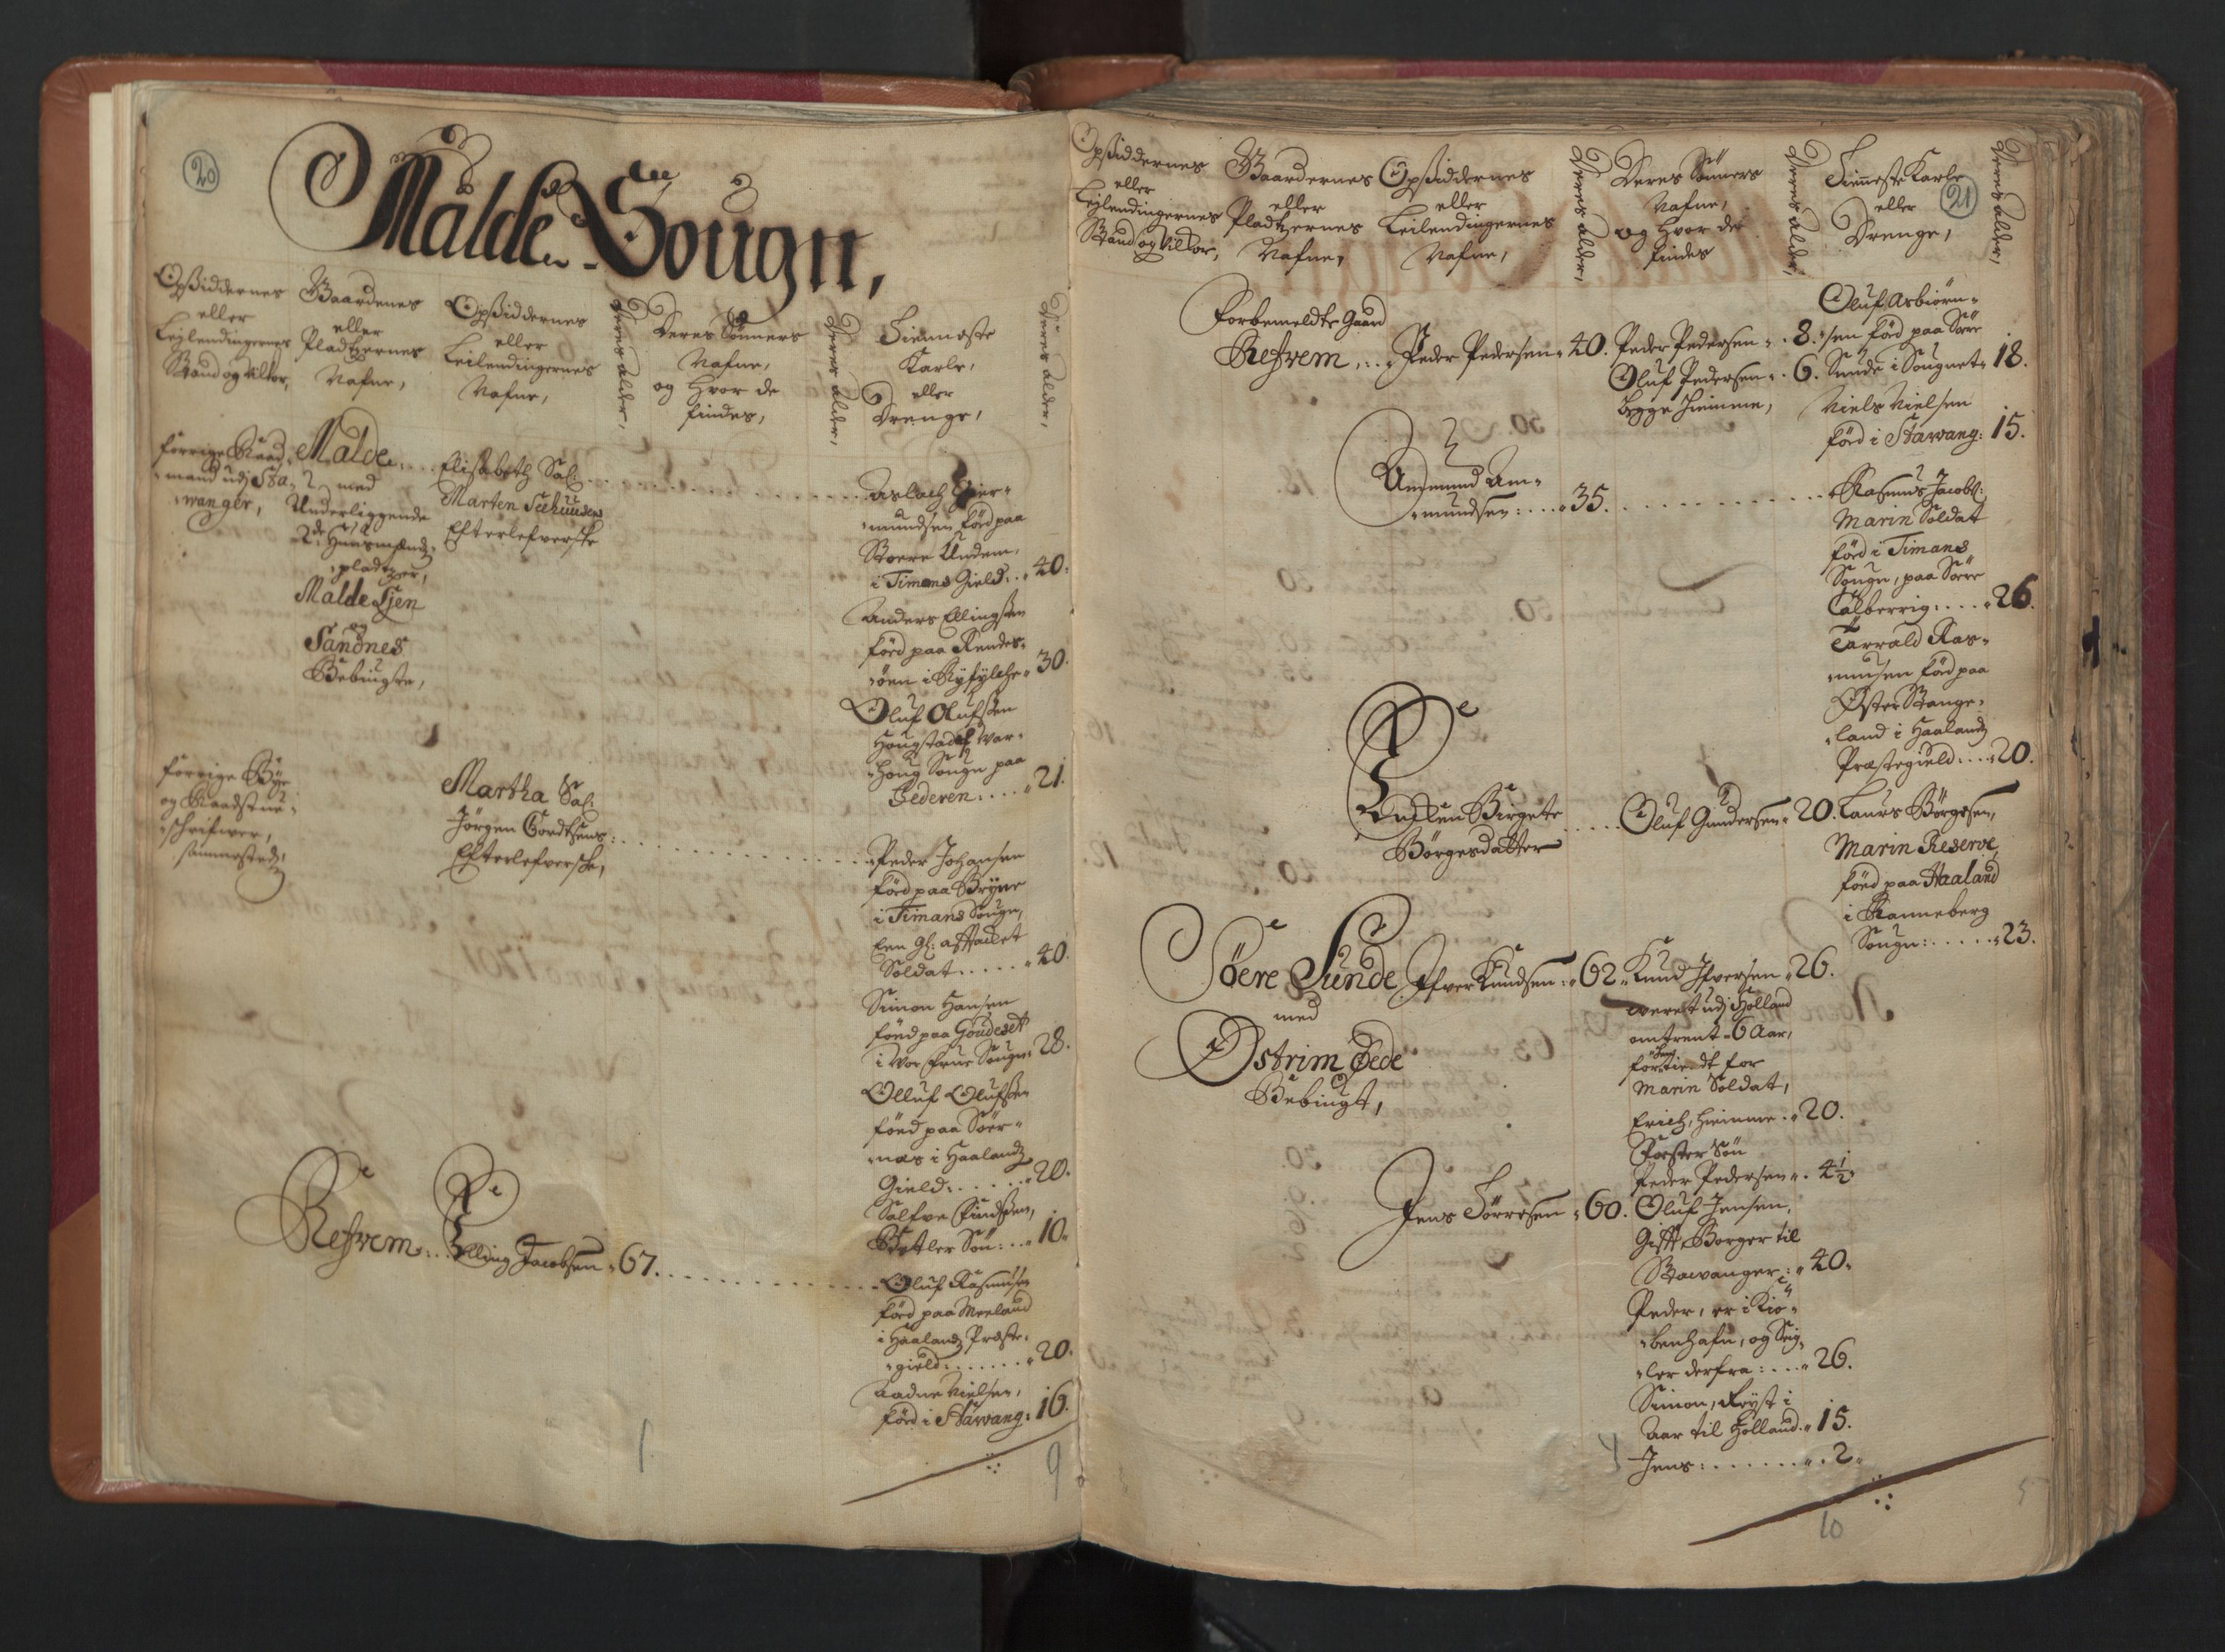 RA, Manntallet 1701, nr. 4: Jæren og Dalane fogderi, 1701, s. 20-21